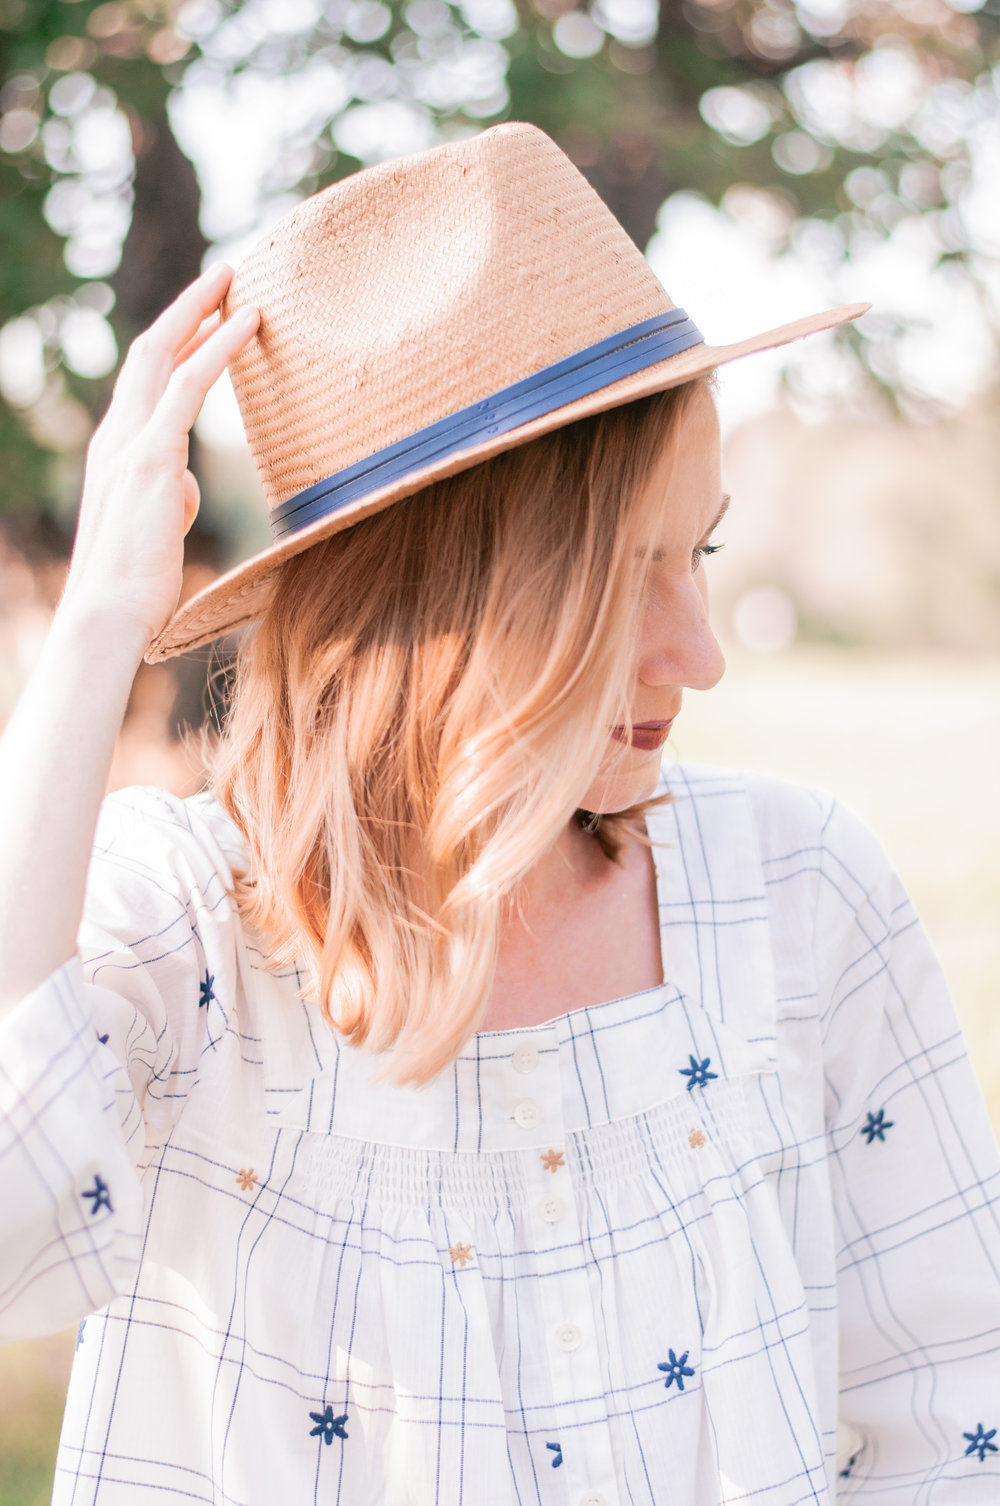 the-best-fall-hats-for-women-1.jpg